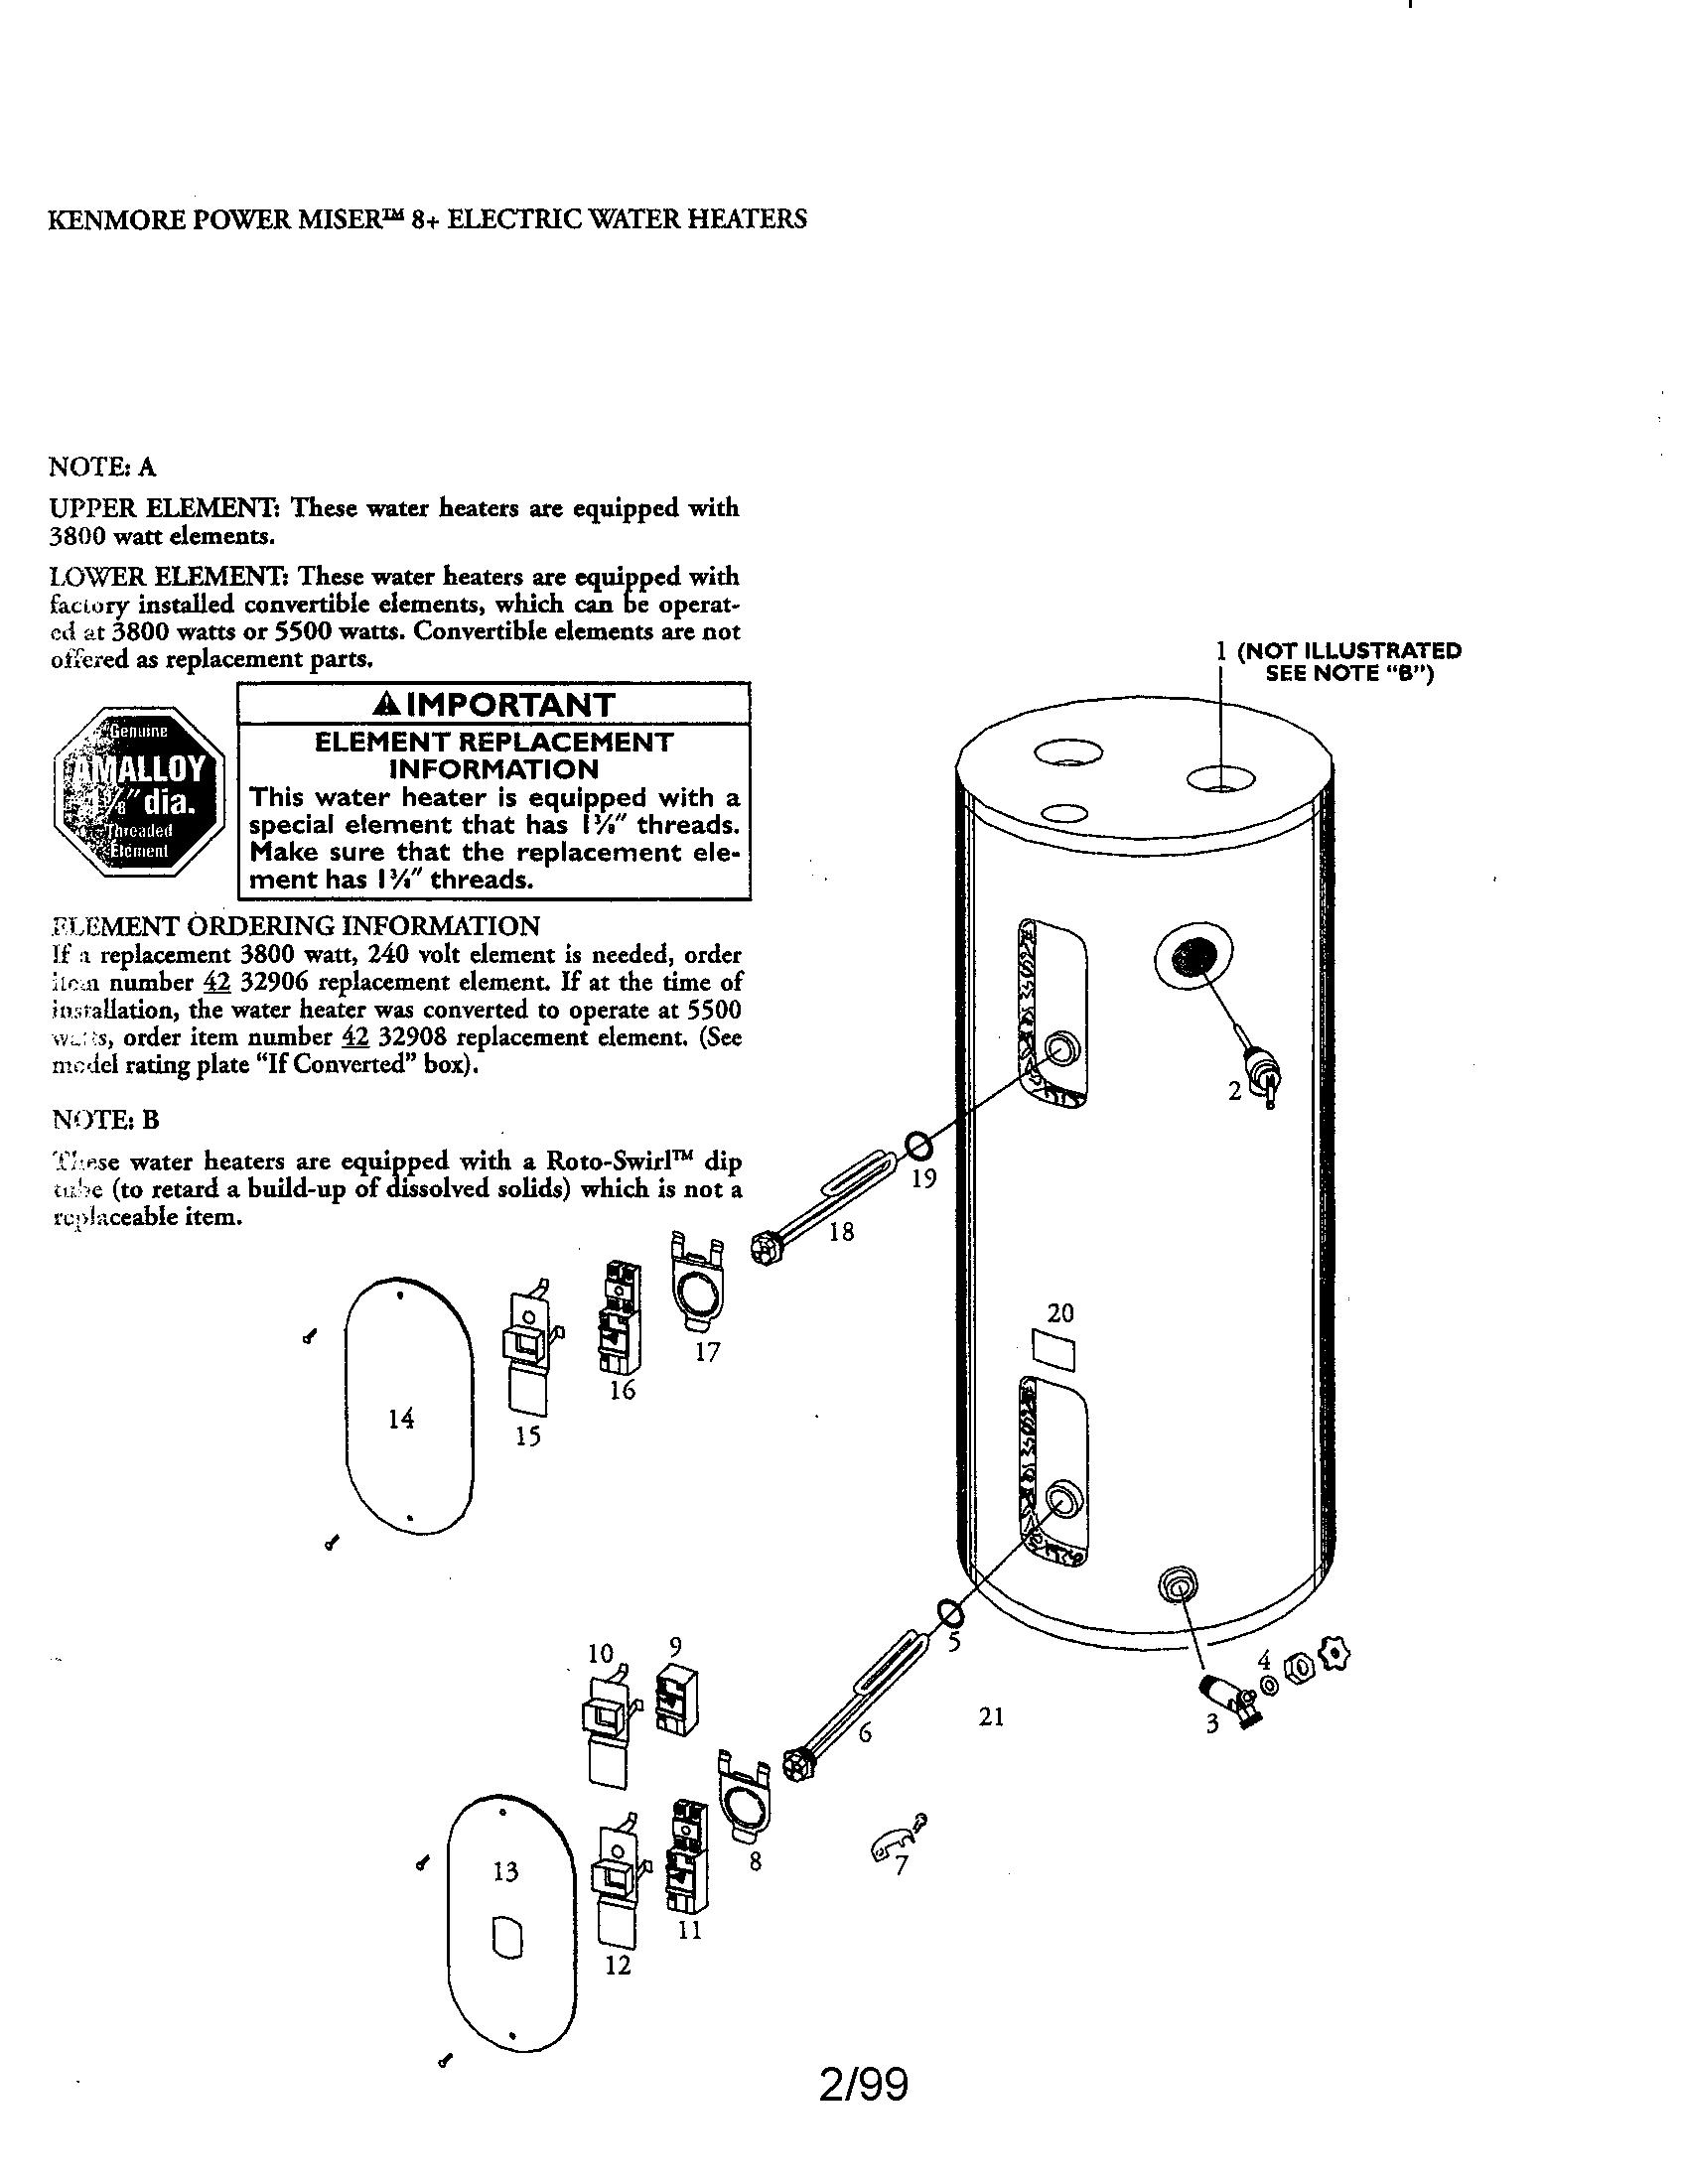 Kenmore model 153327564 water heater, electric genuine parts